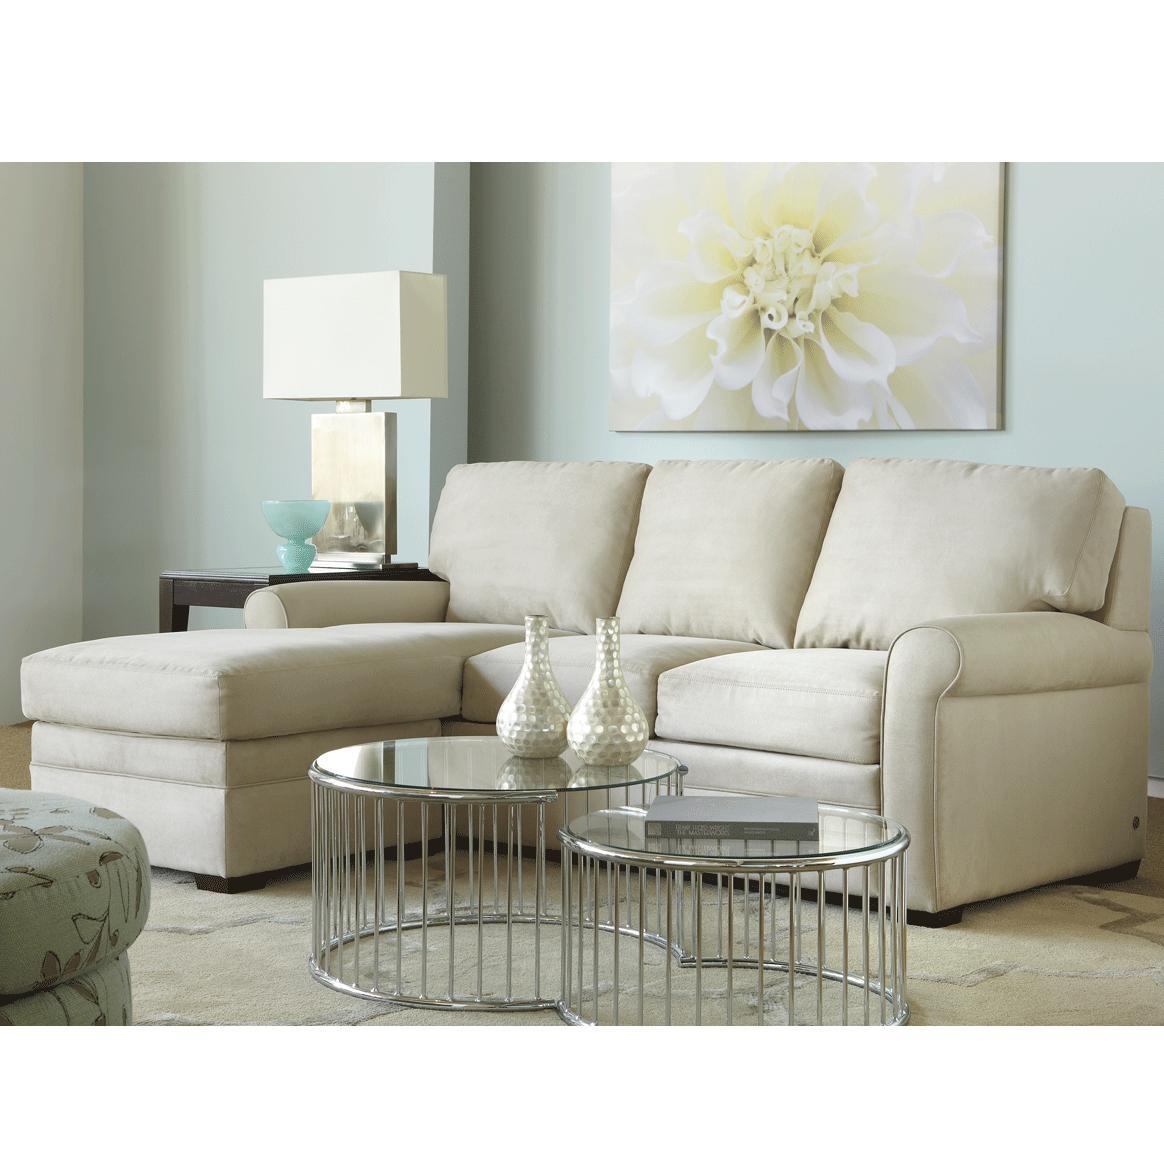 Furniture: Tempurpedic Sleeper Sofa | Sofa Sleepers | Foam Sofa For American Sofa Beds (Image 14 of 22)